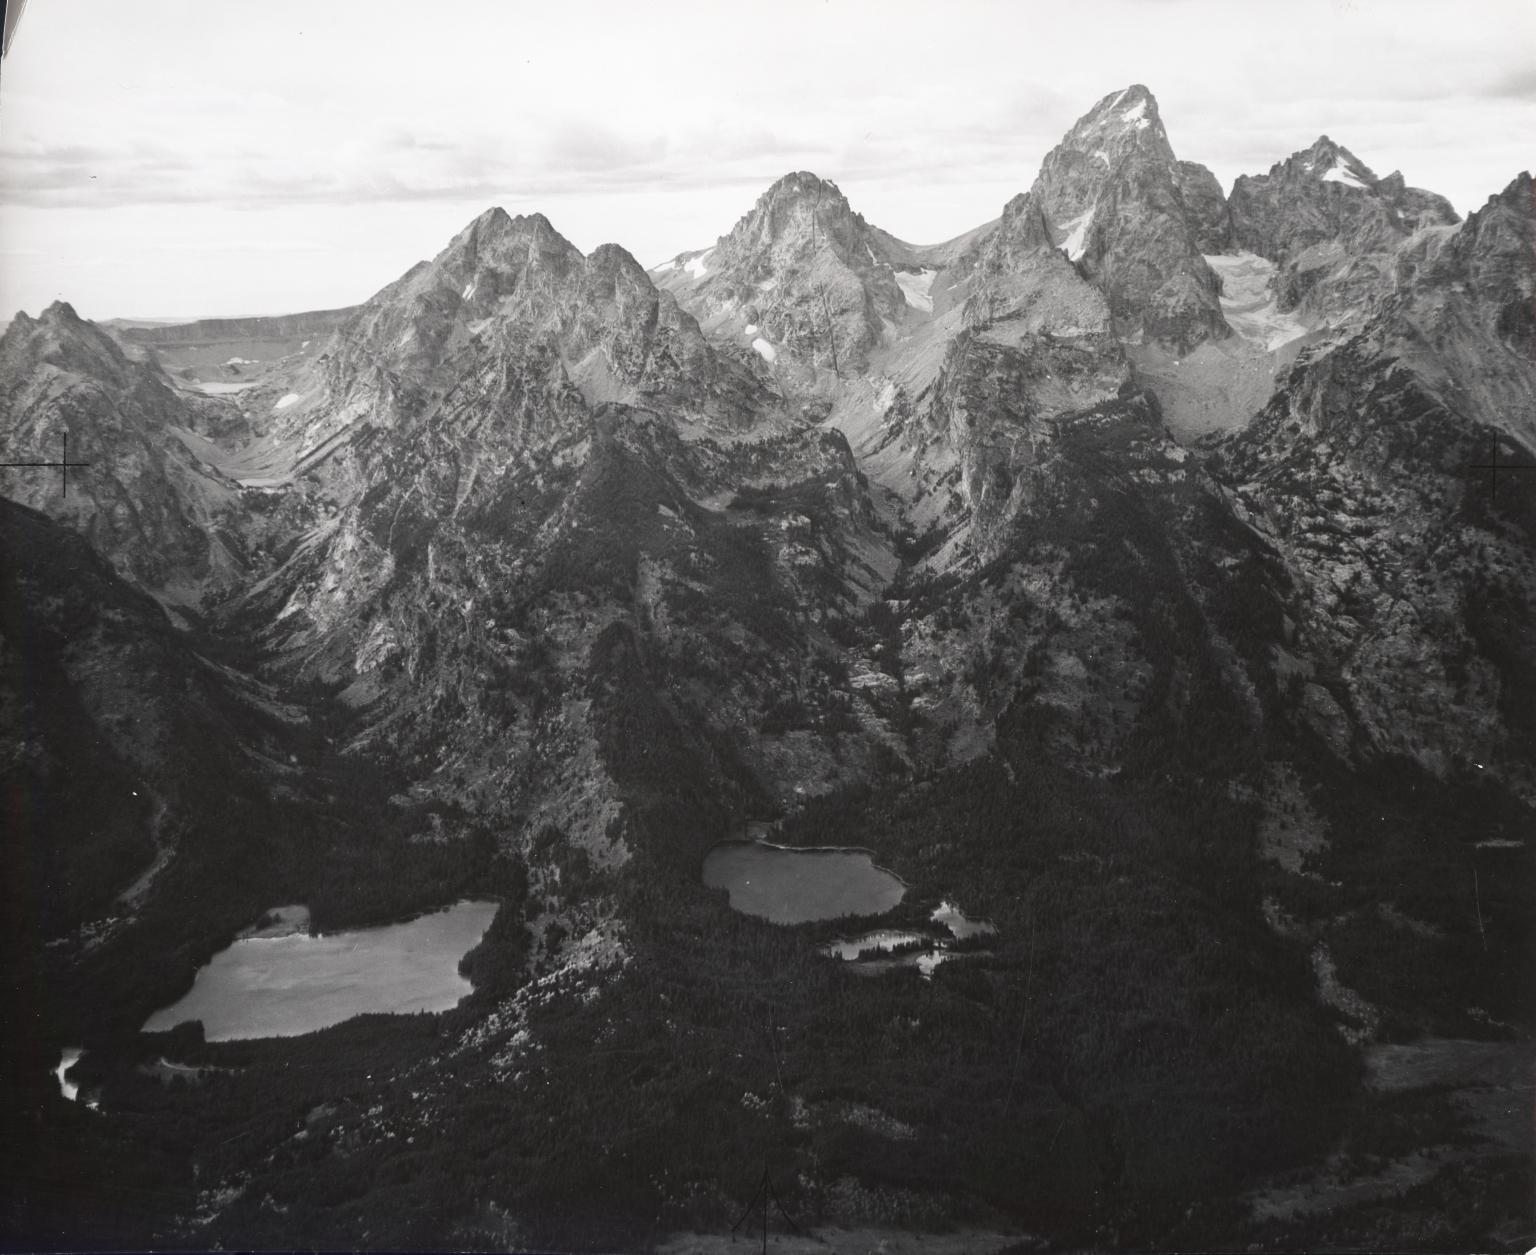 Grand Teton Glacier, Wyoming, United States